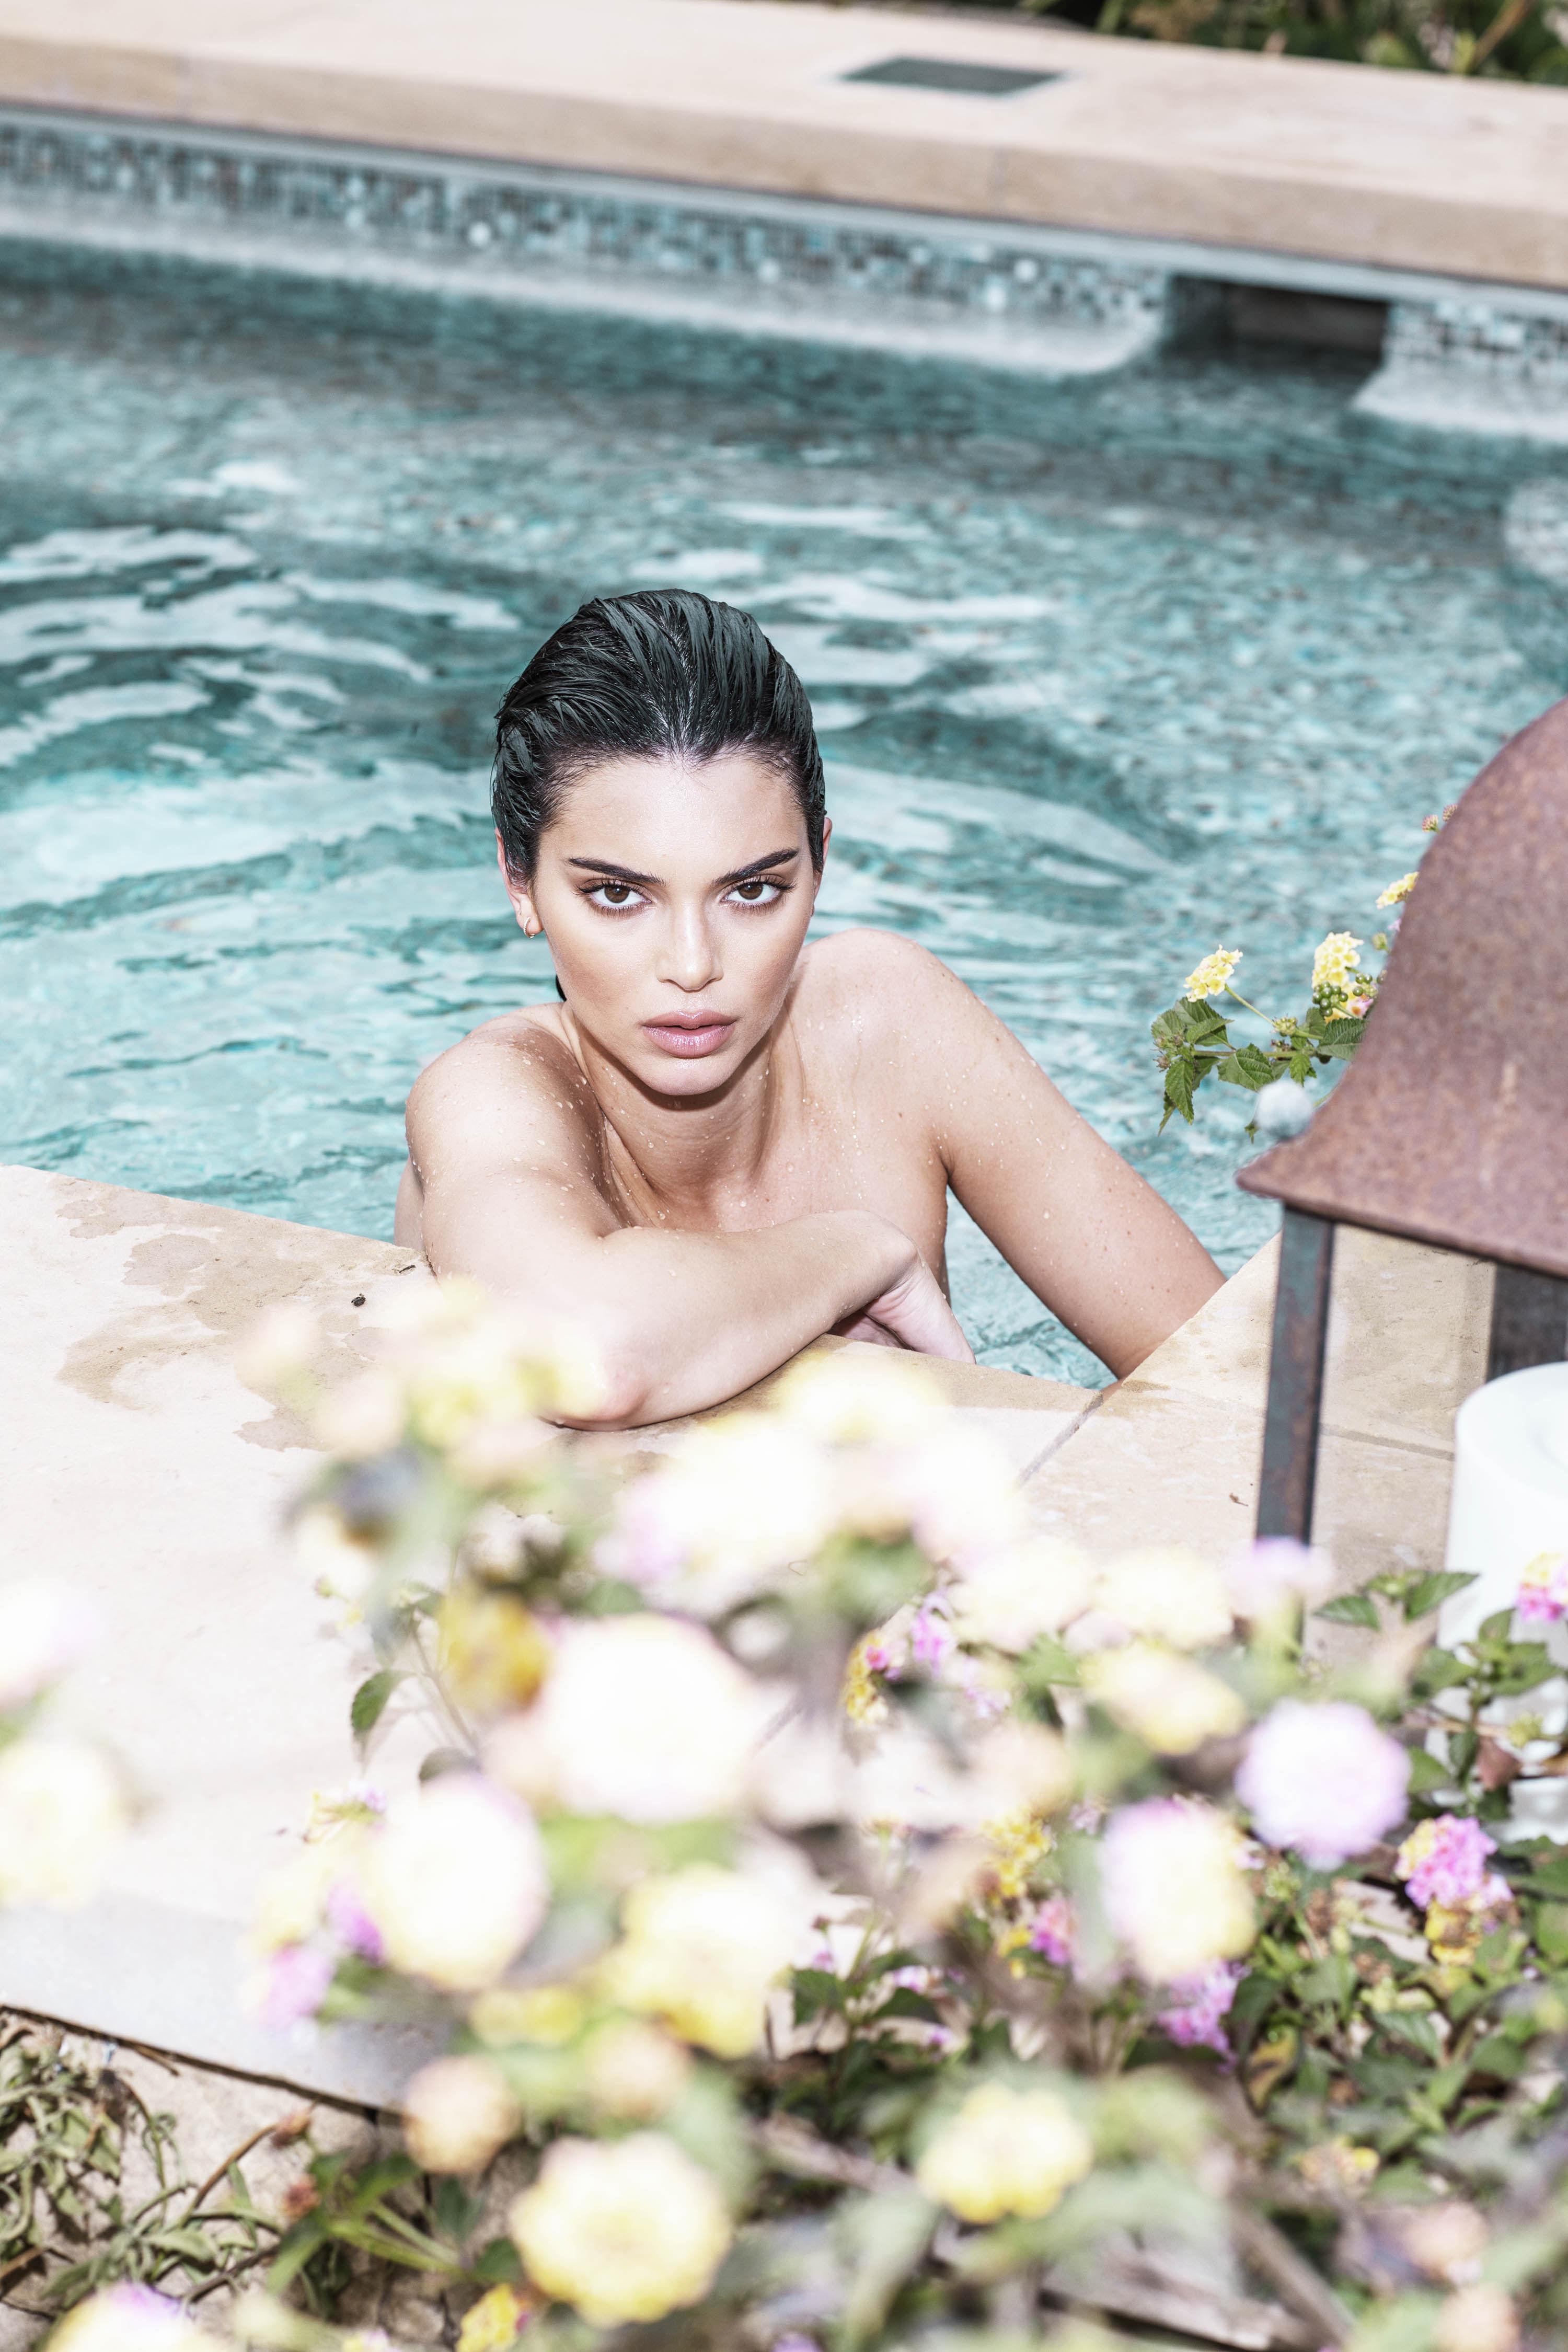 0810235419680_24_Kendall-Jenner-Nude-TheFappeningBlog.com-25.jpg